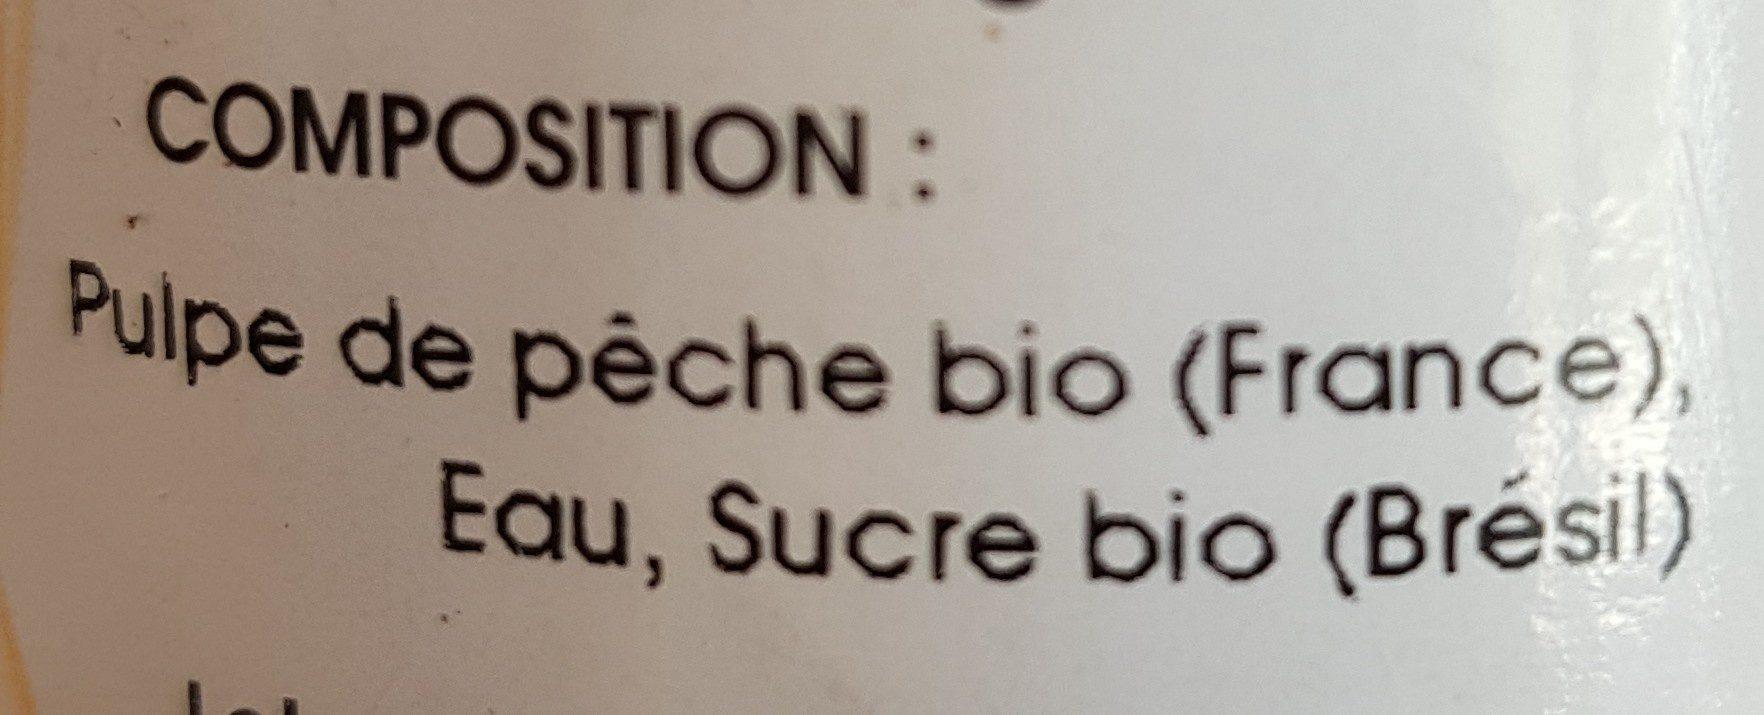 Nectar de pêche - Ingrediënten - fr